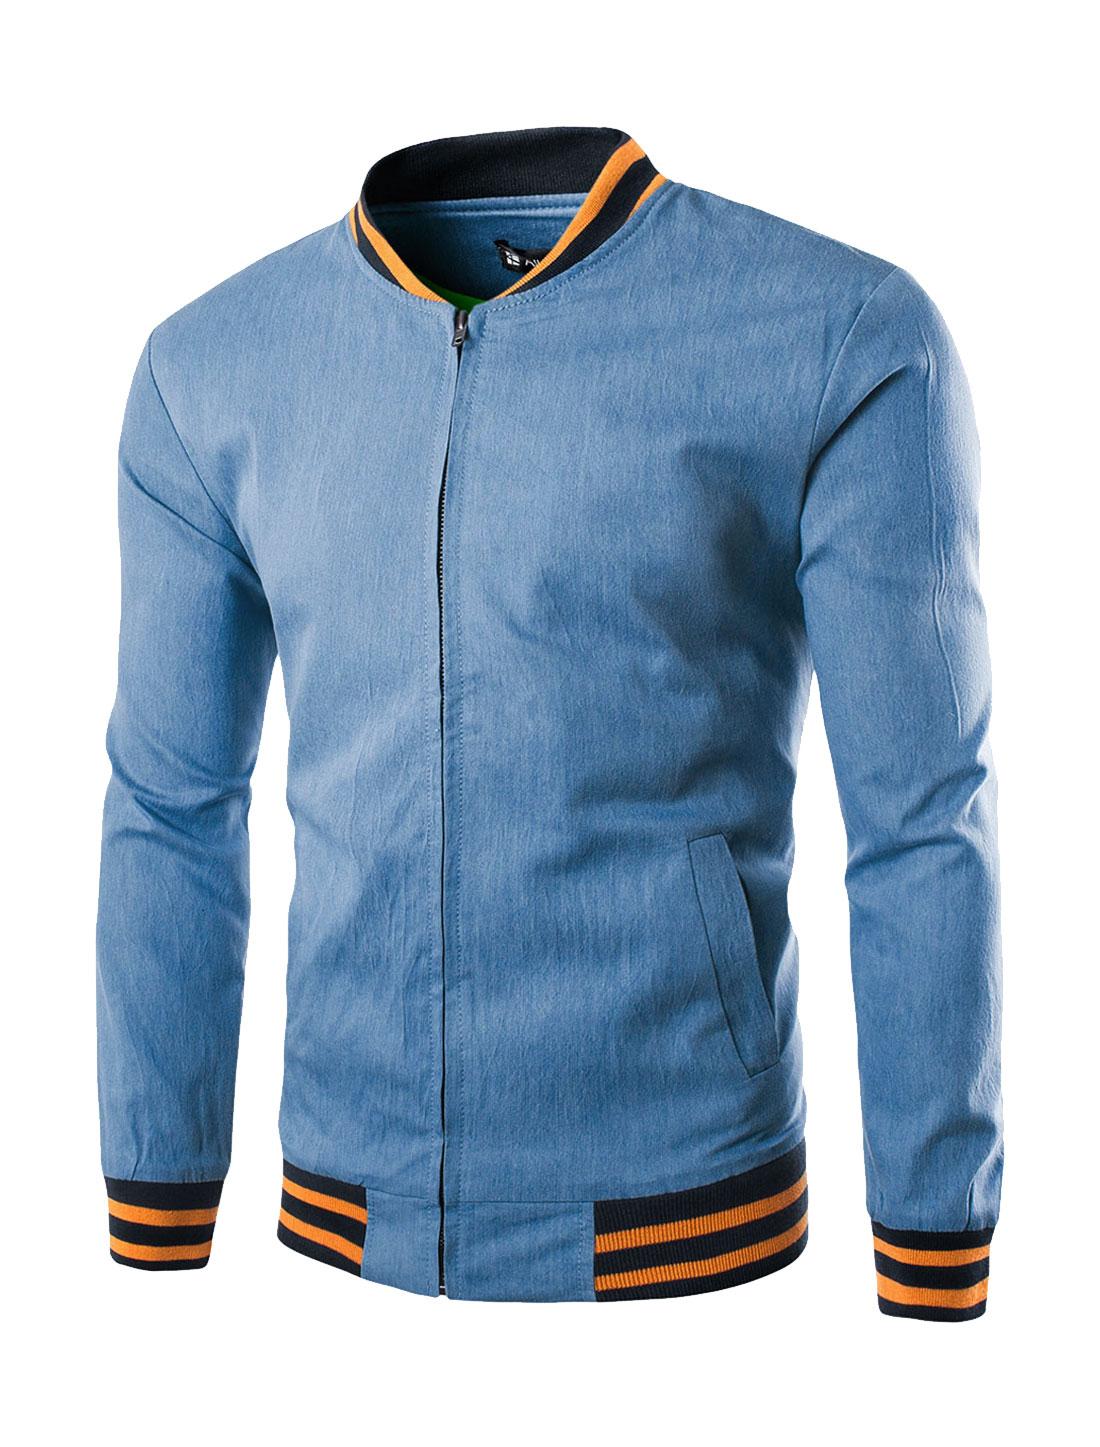 Men Long Sleeve Full Zipper Front Pockets Slim Fit Jackets Blue M